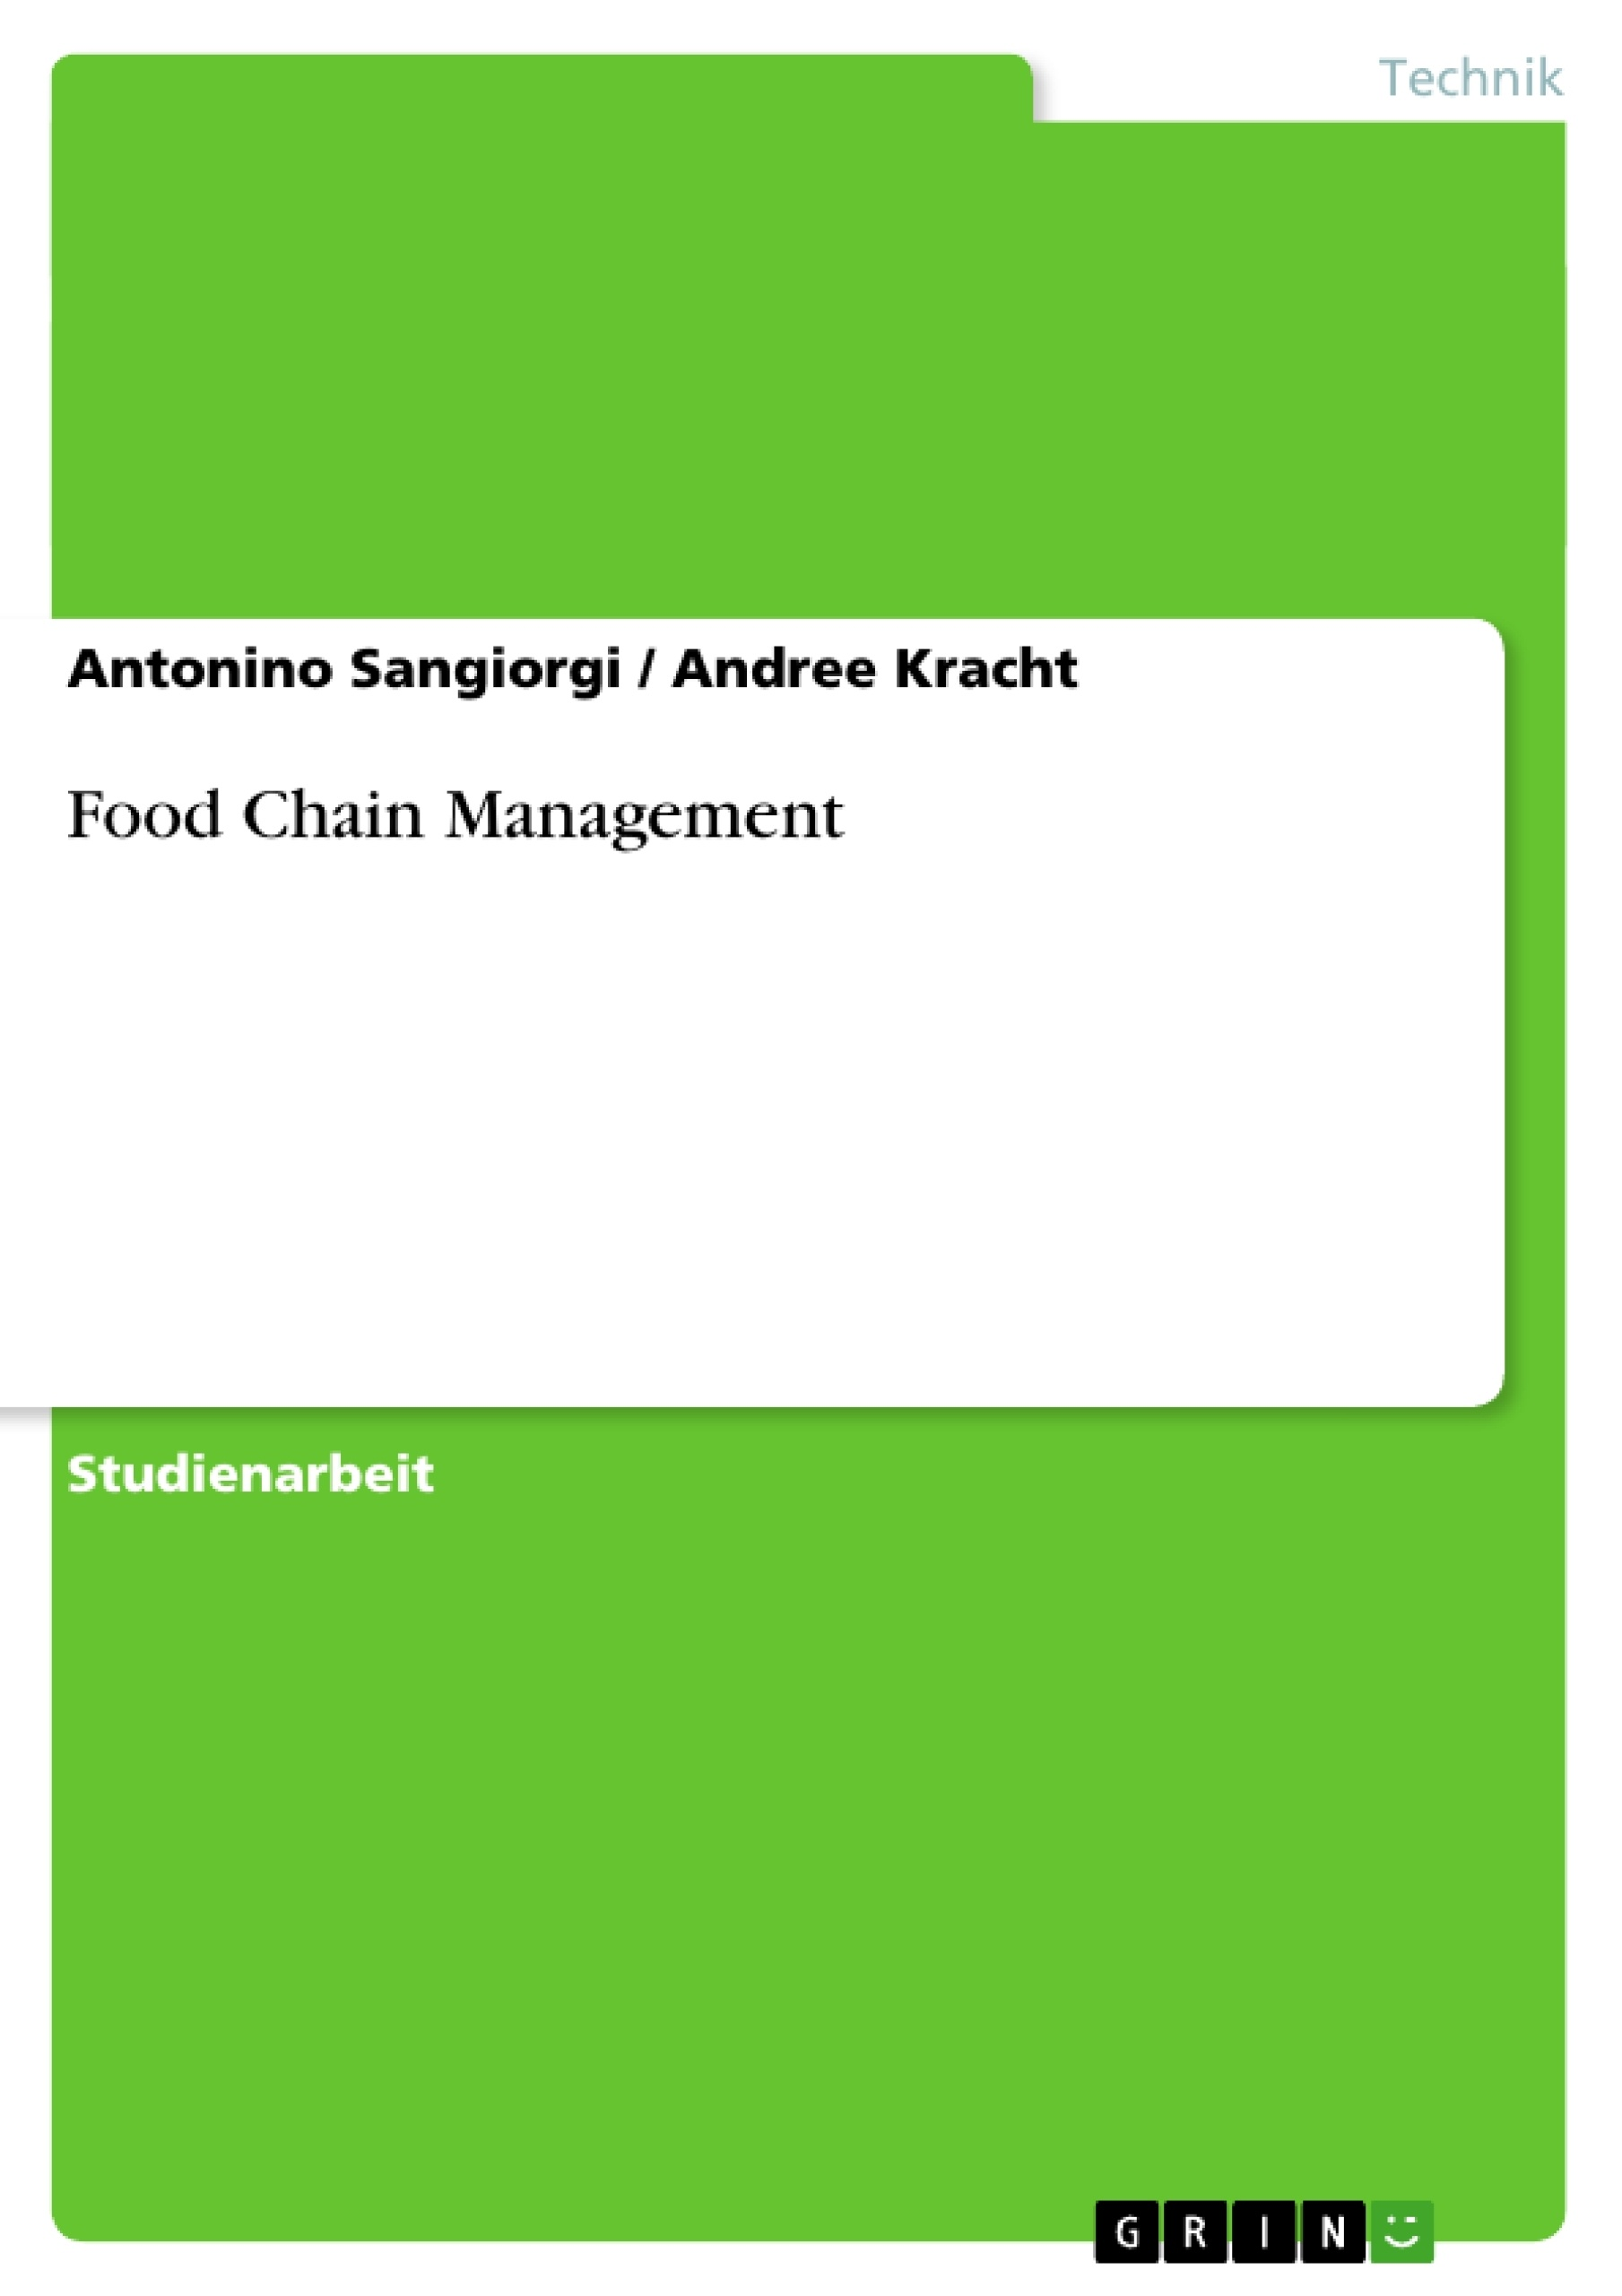 Titel: Food Chain Management